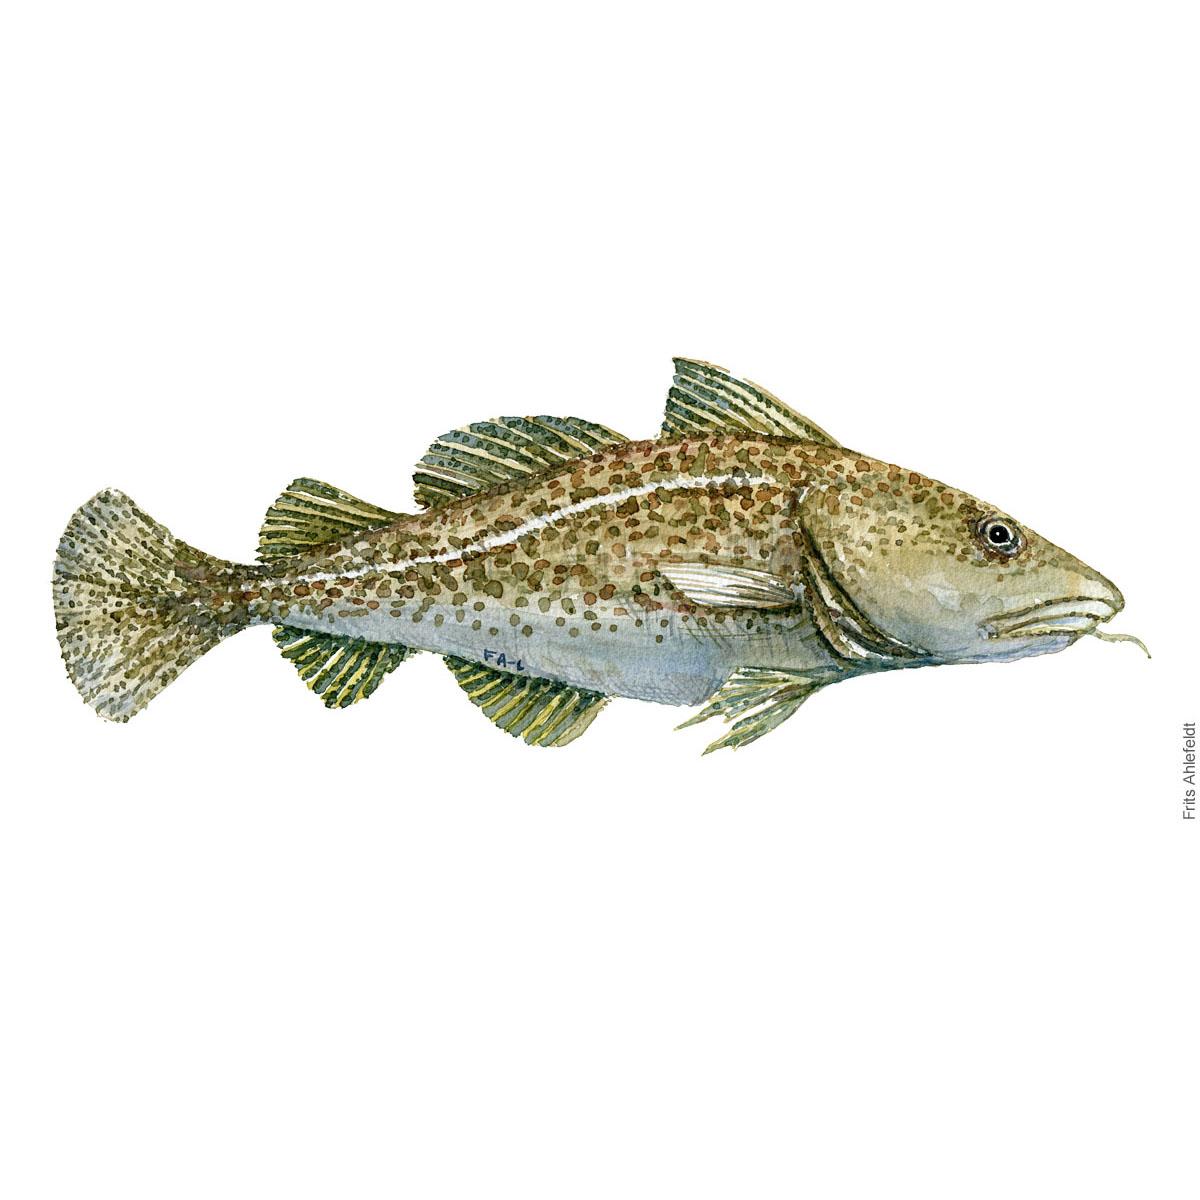 Torsk - Cod Fish painting in watercolor by Frits Ahlefeldt - Fiske akvarel